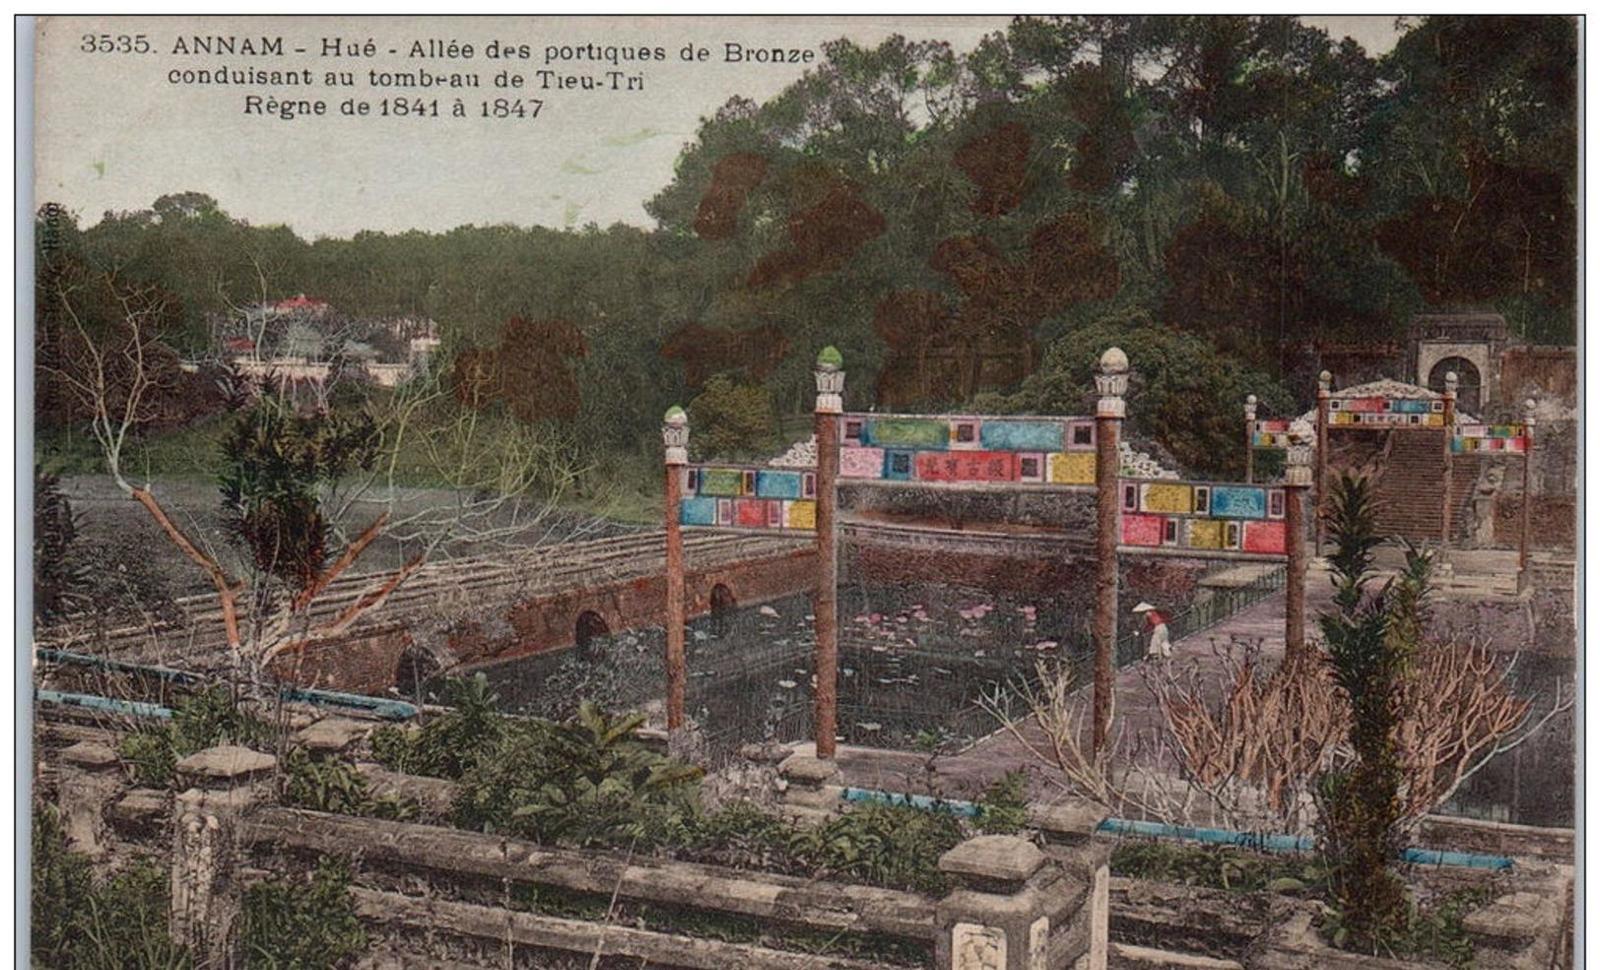 Hué -  INDOCHINE -ANNAM - HUE - allée des portiques ---